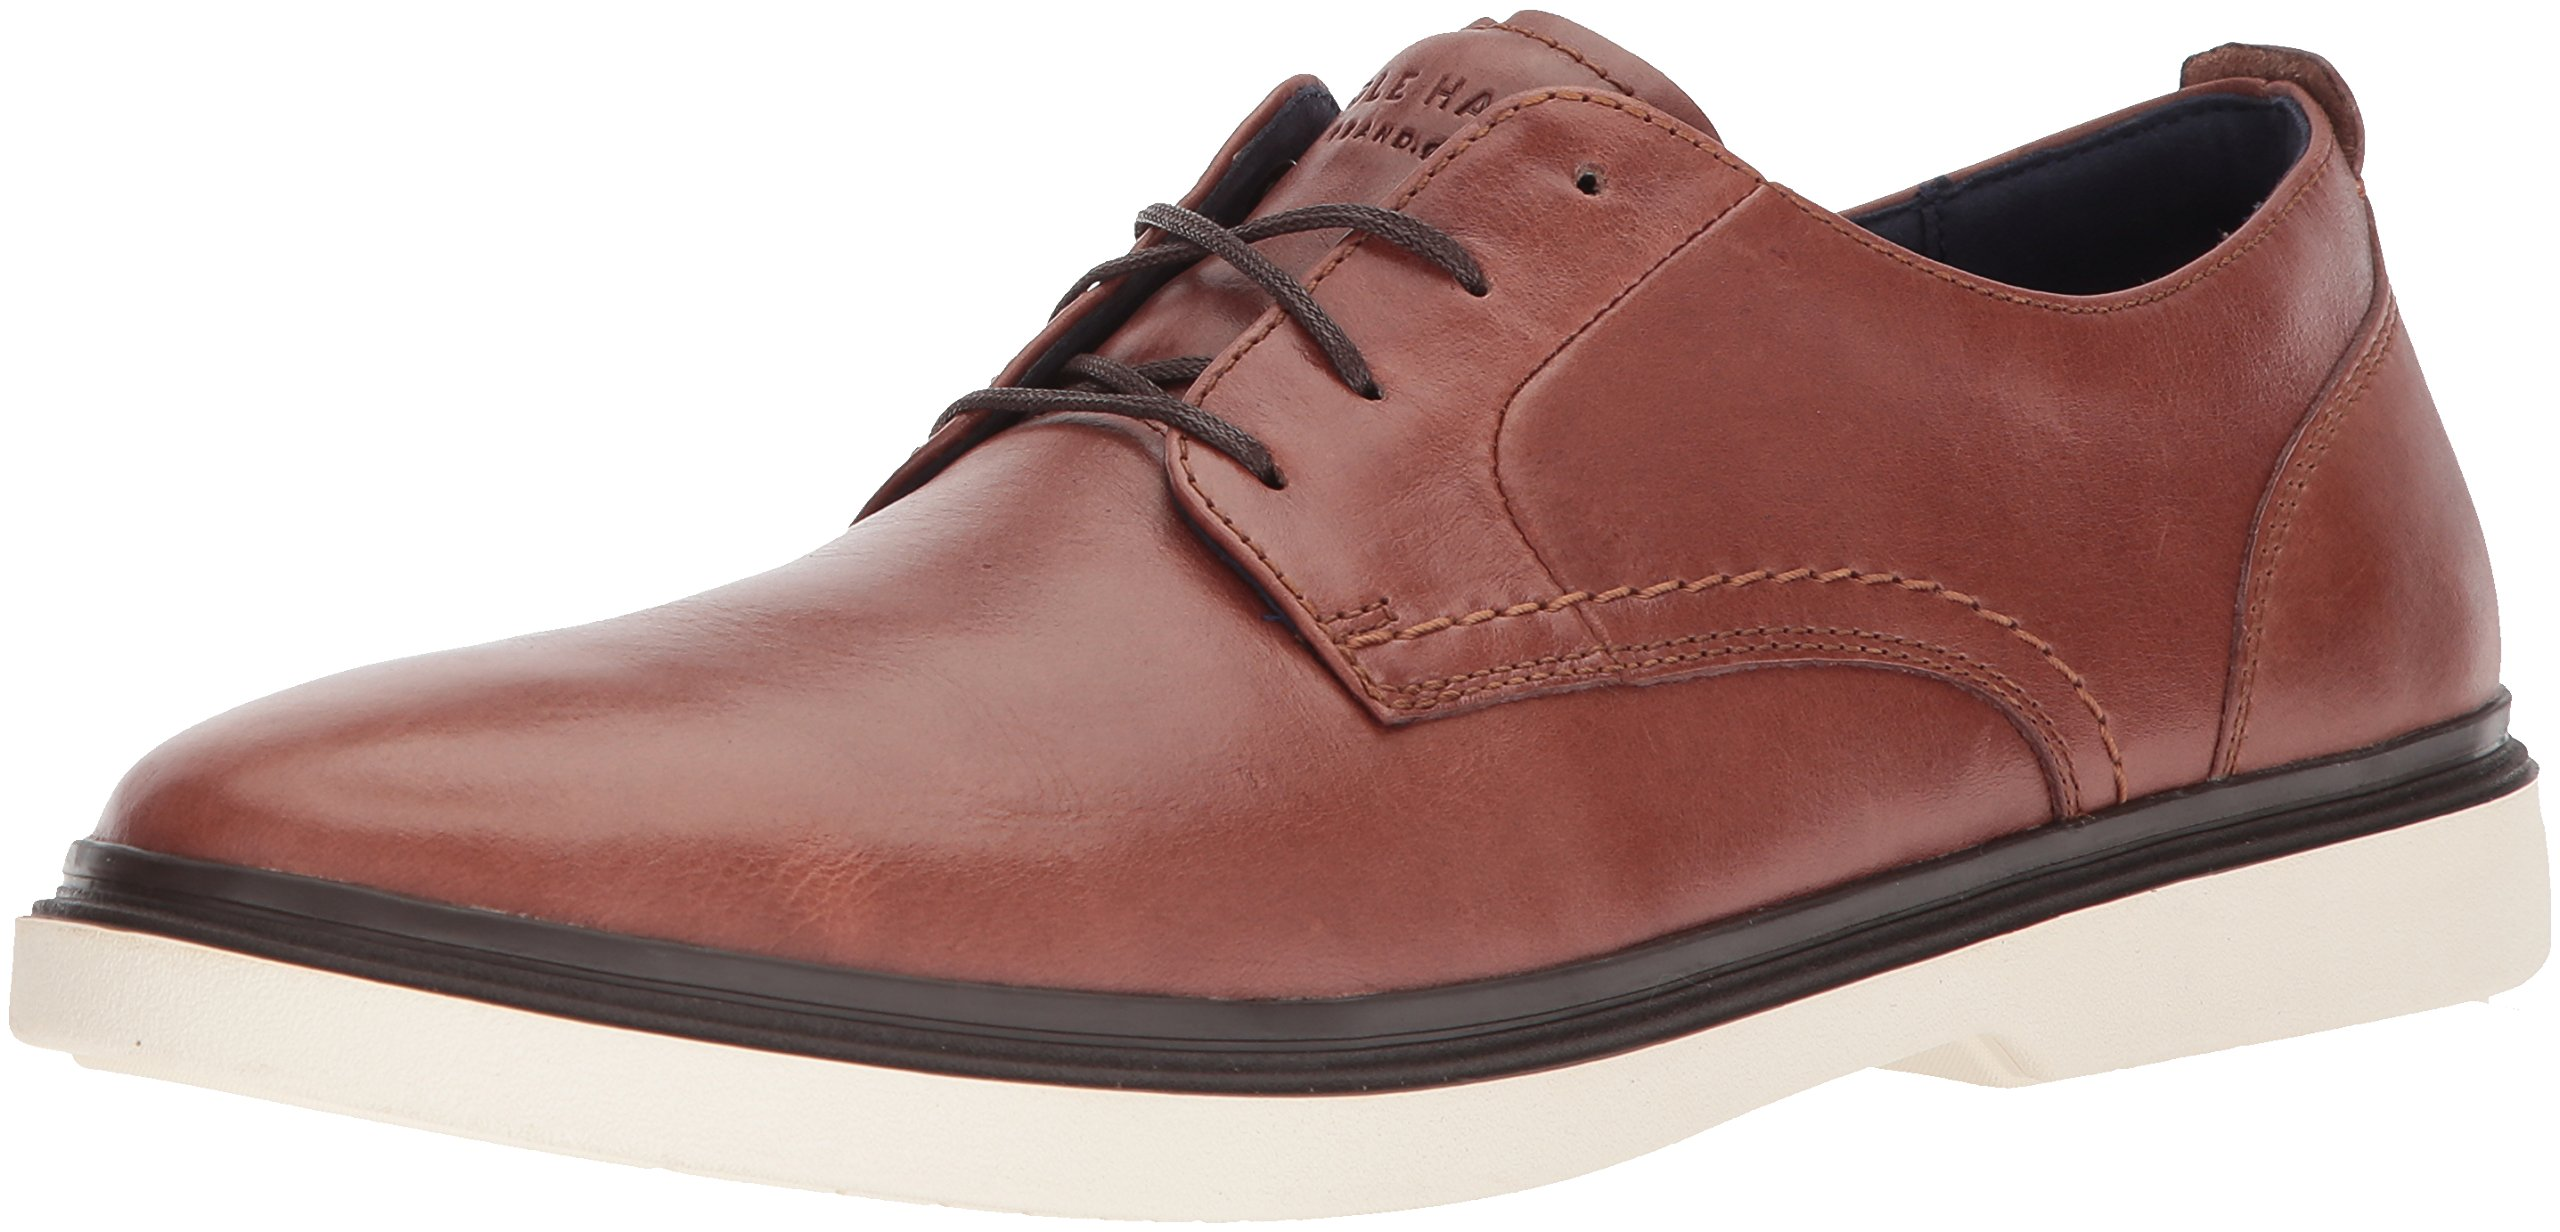 Cole Haan Men's Brandt Plain Toe Oxford, Woodbury/Ivory, 9.5 Medium US